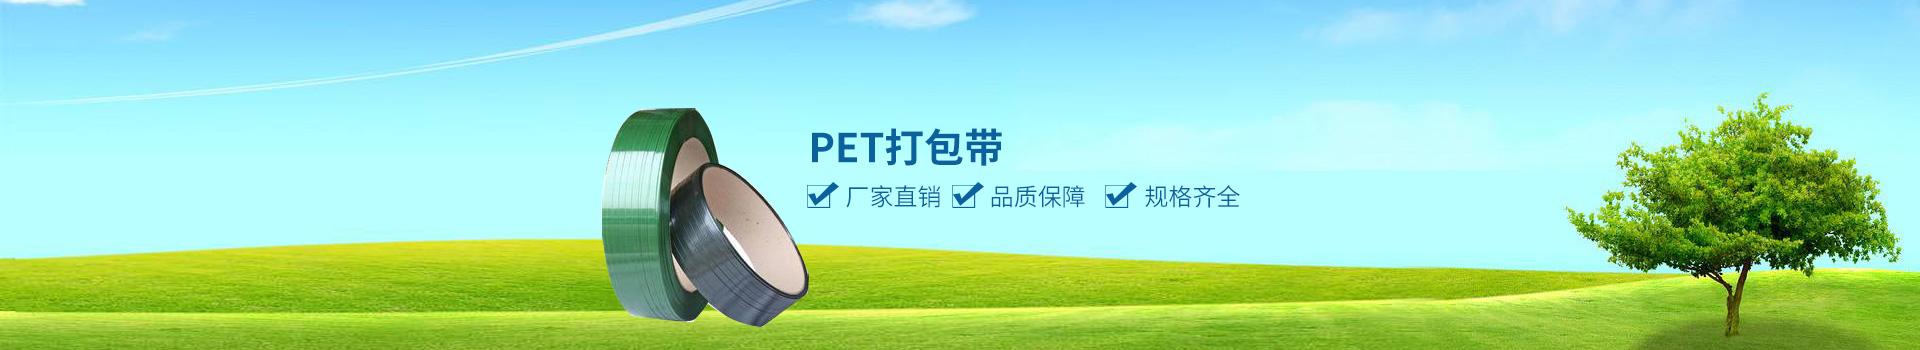 PET打包带